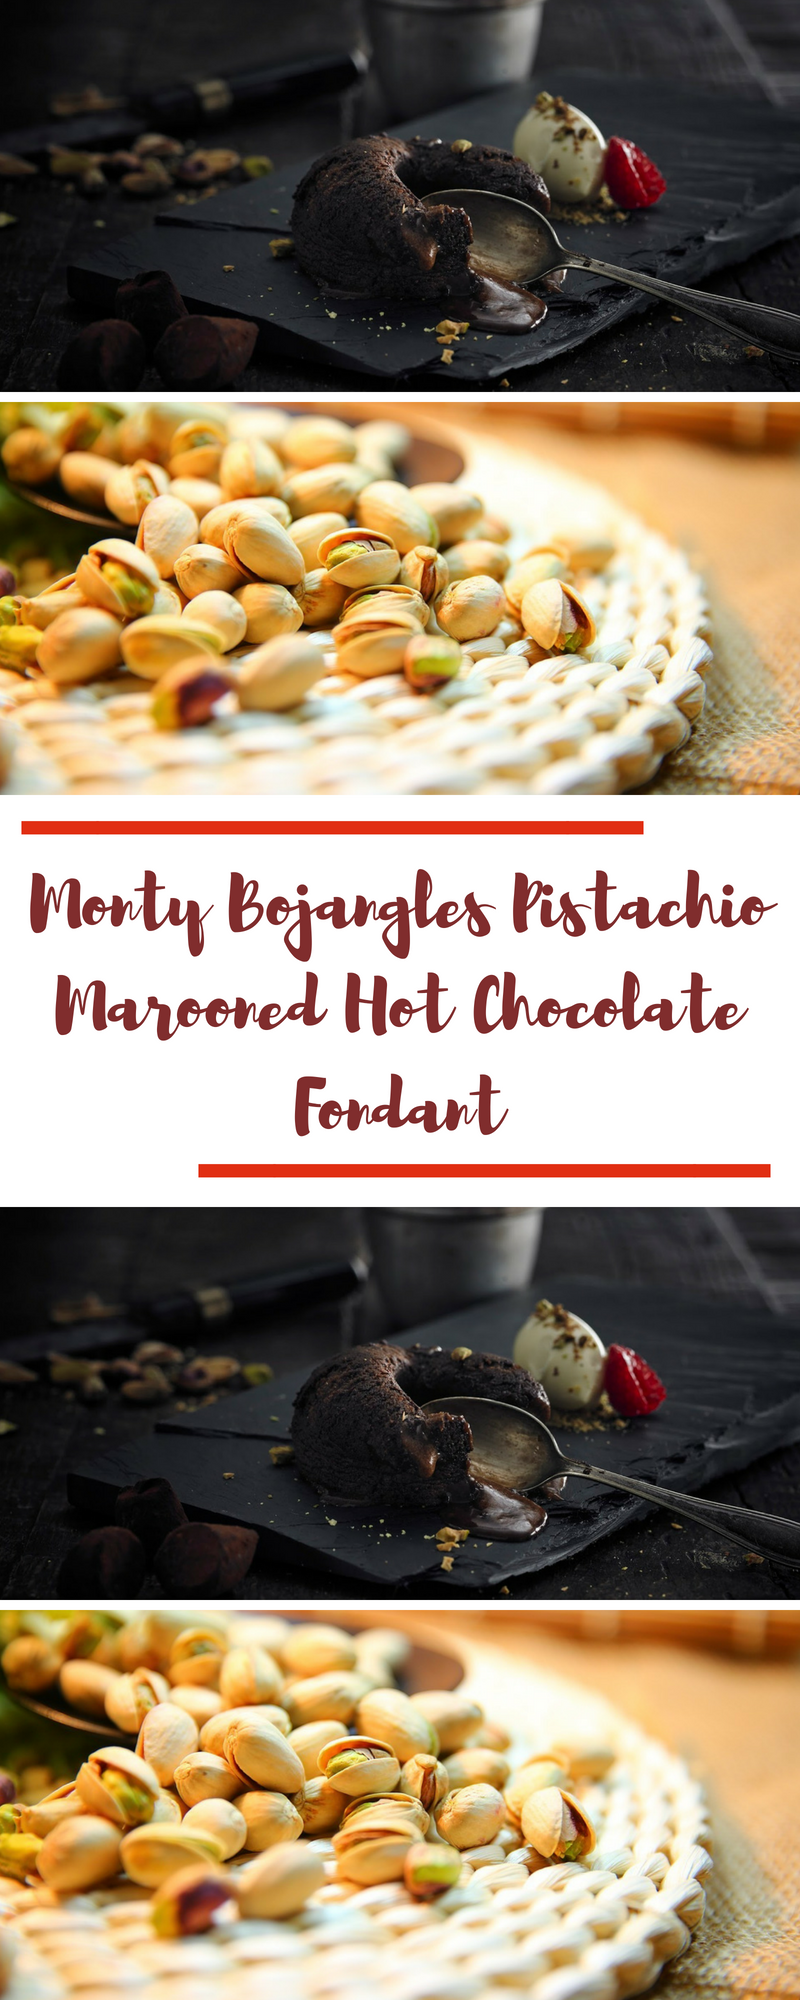 Monty Bojangles Pistachio Marooned Hot Chocolate Fondant